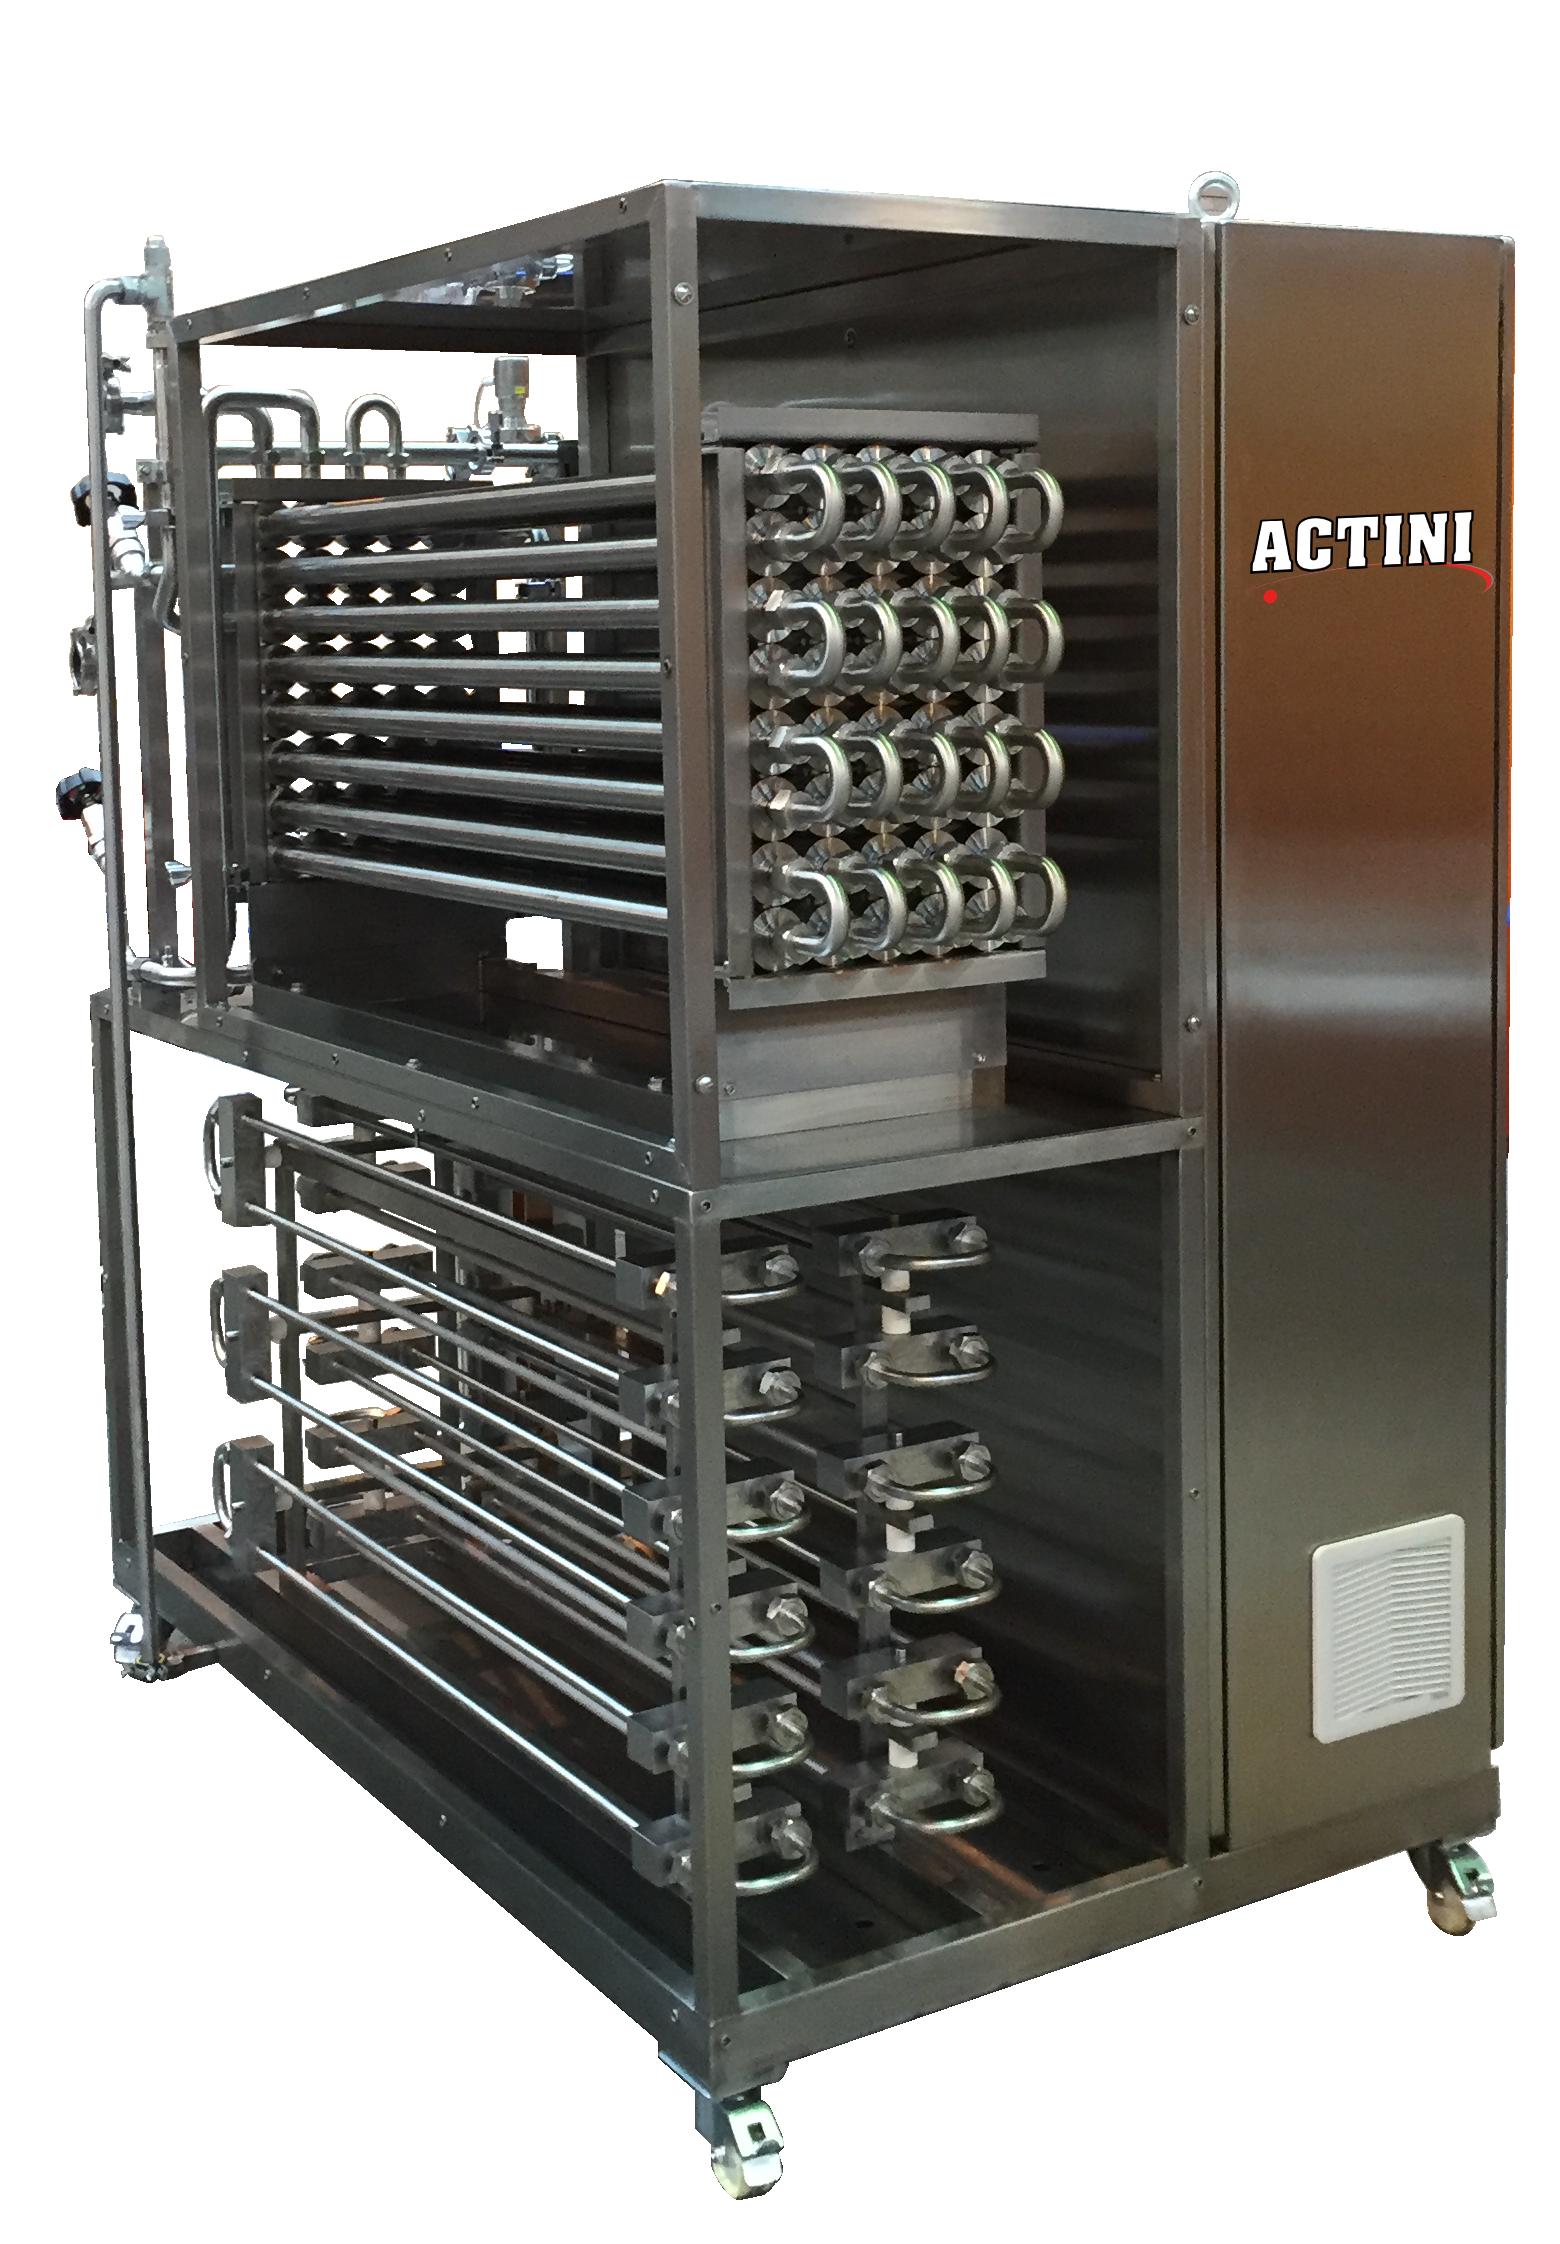 ACTINI Heat treatment pilot